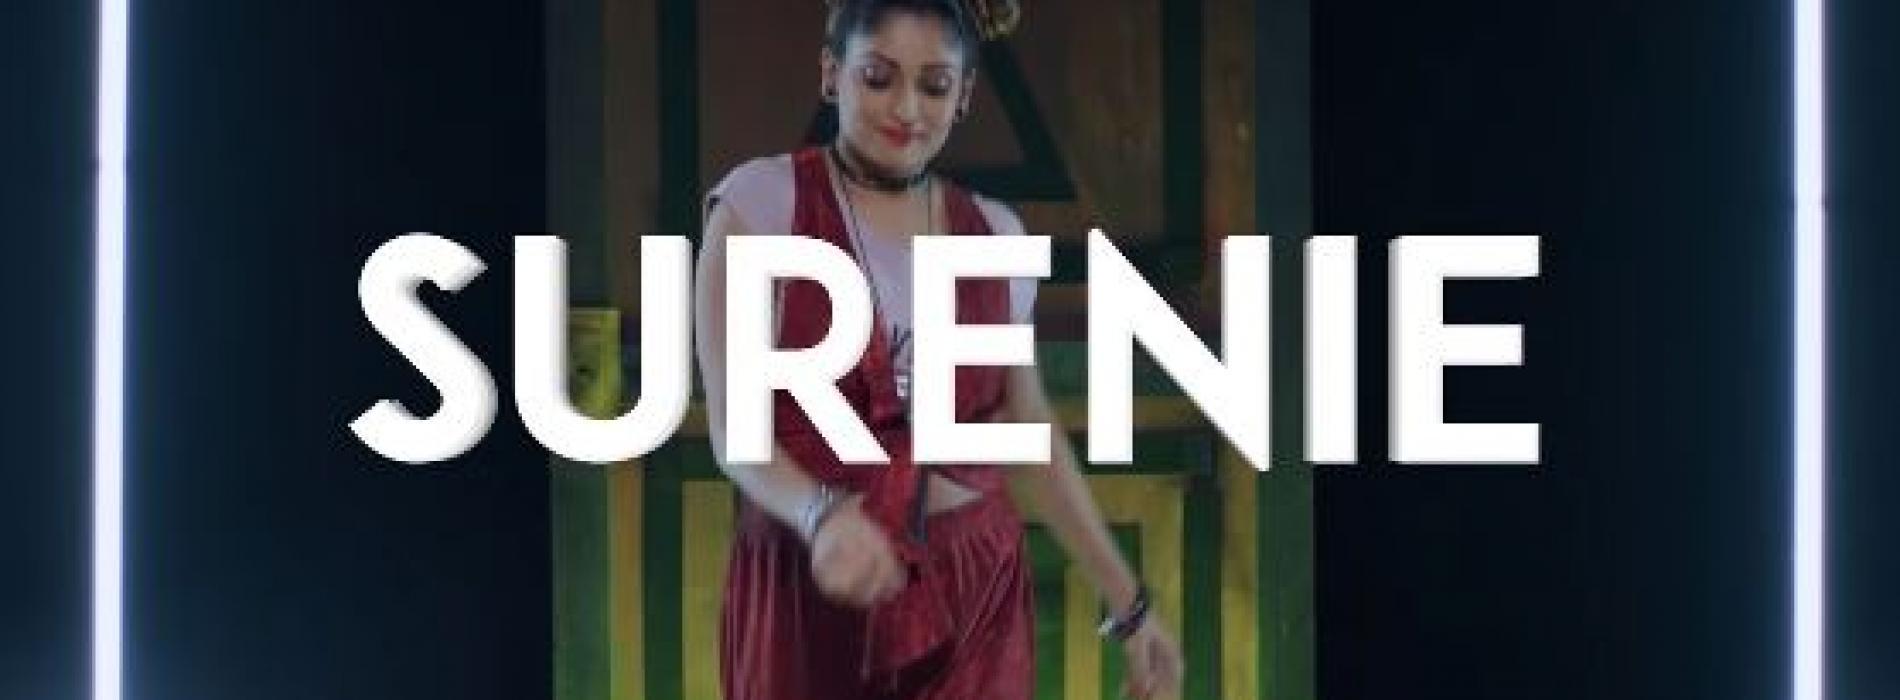 New Music : Surenie – Kaatath Hora | සුරේනි – කාටත් හොරා (Official Music Video)